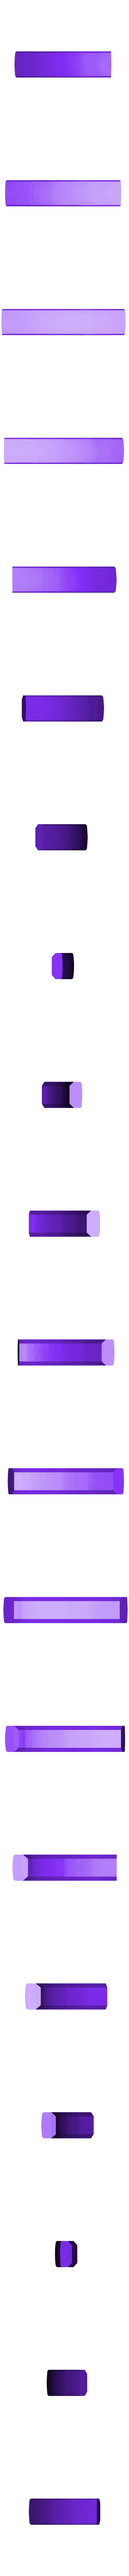 Lightcycle_Window_Top.STL Download free STL file Lightcycle Model Kit • Design to 3D print, billythemighty3Dprinter